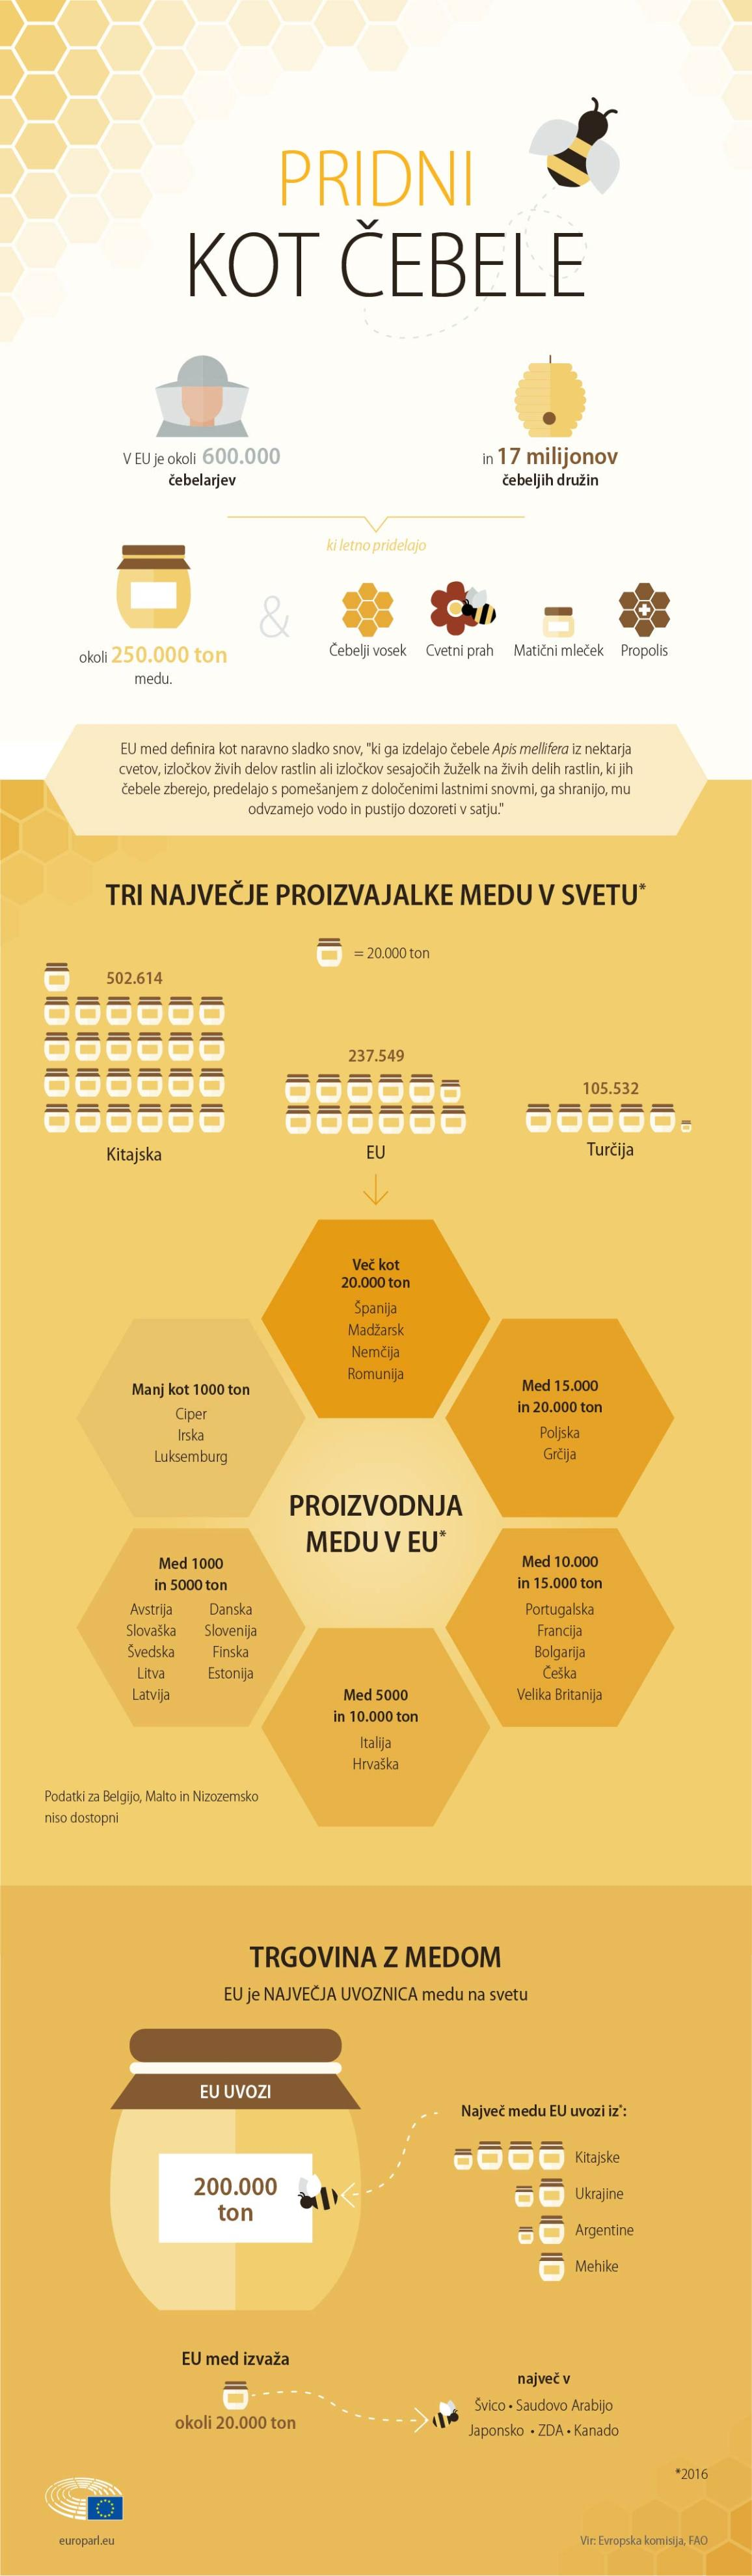 med trg medu čebele čebelarstvo